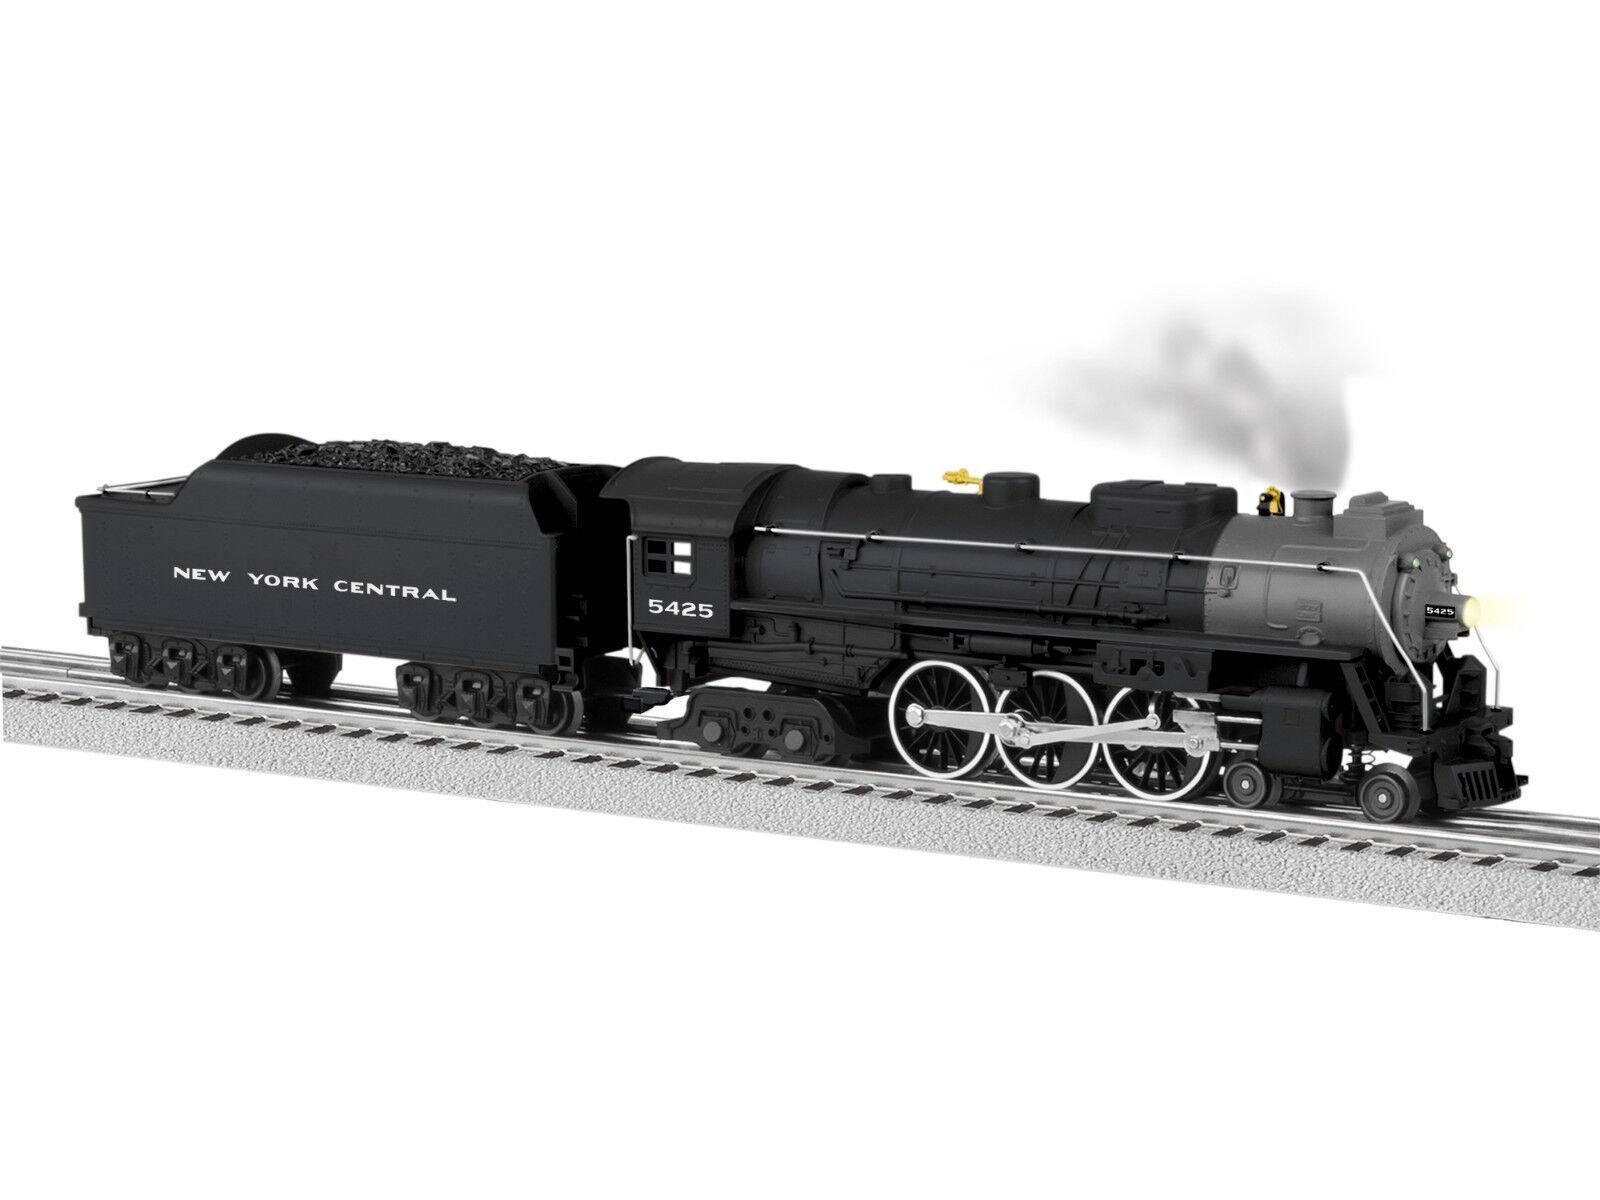 Lionel 6-84934 New York Central LC Hudson Locomotive & Tender